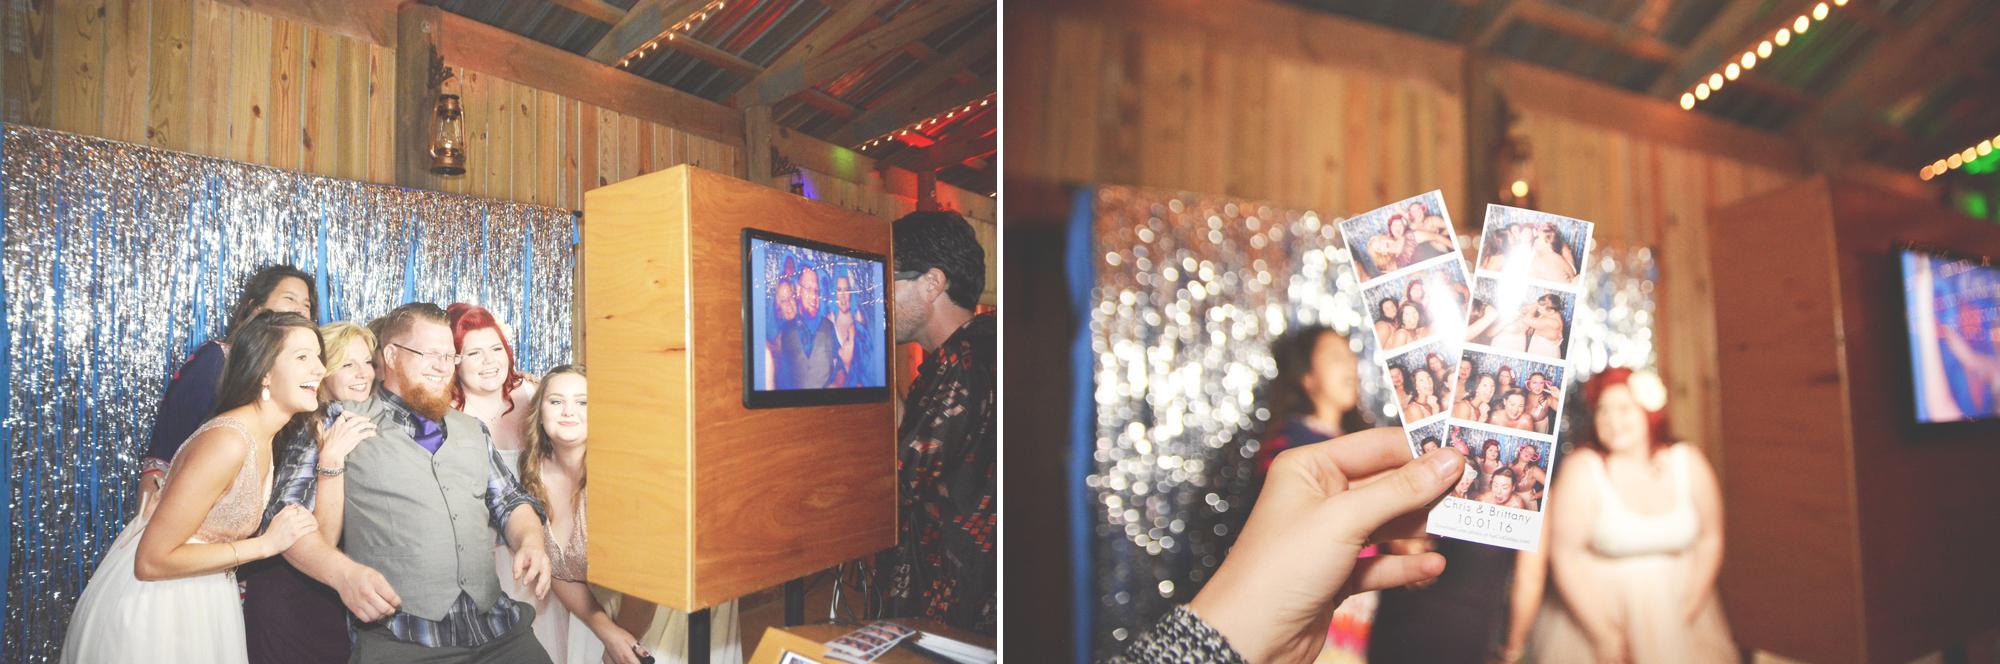 the-red-tin-barn-wedding-six-hearts-photography083